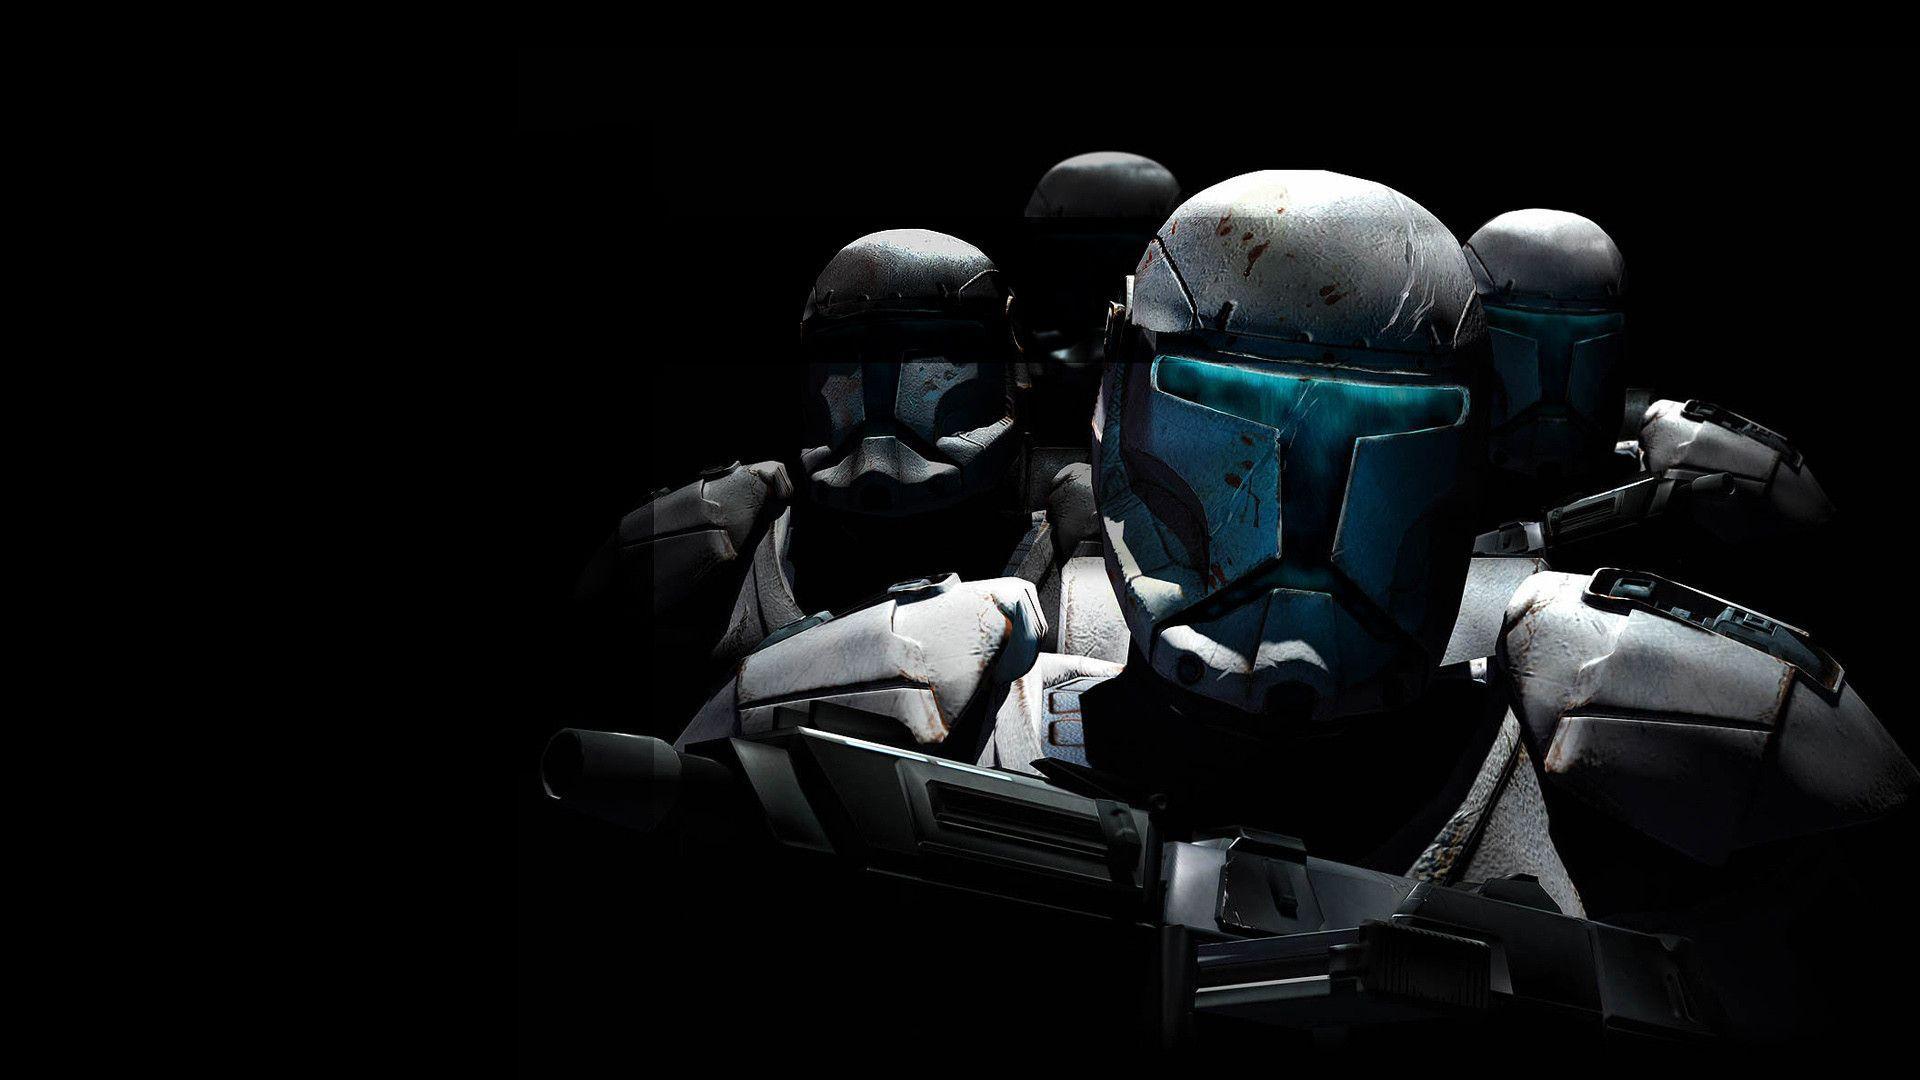 Star Wars Republic Wallpapers Top Free Star Wars Republic Backgrounds Wallpaperaccess